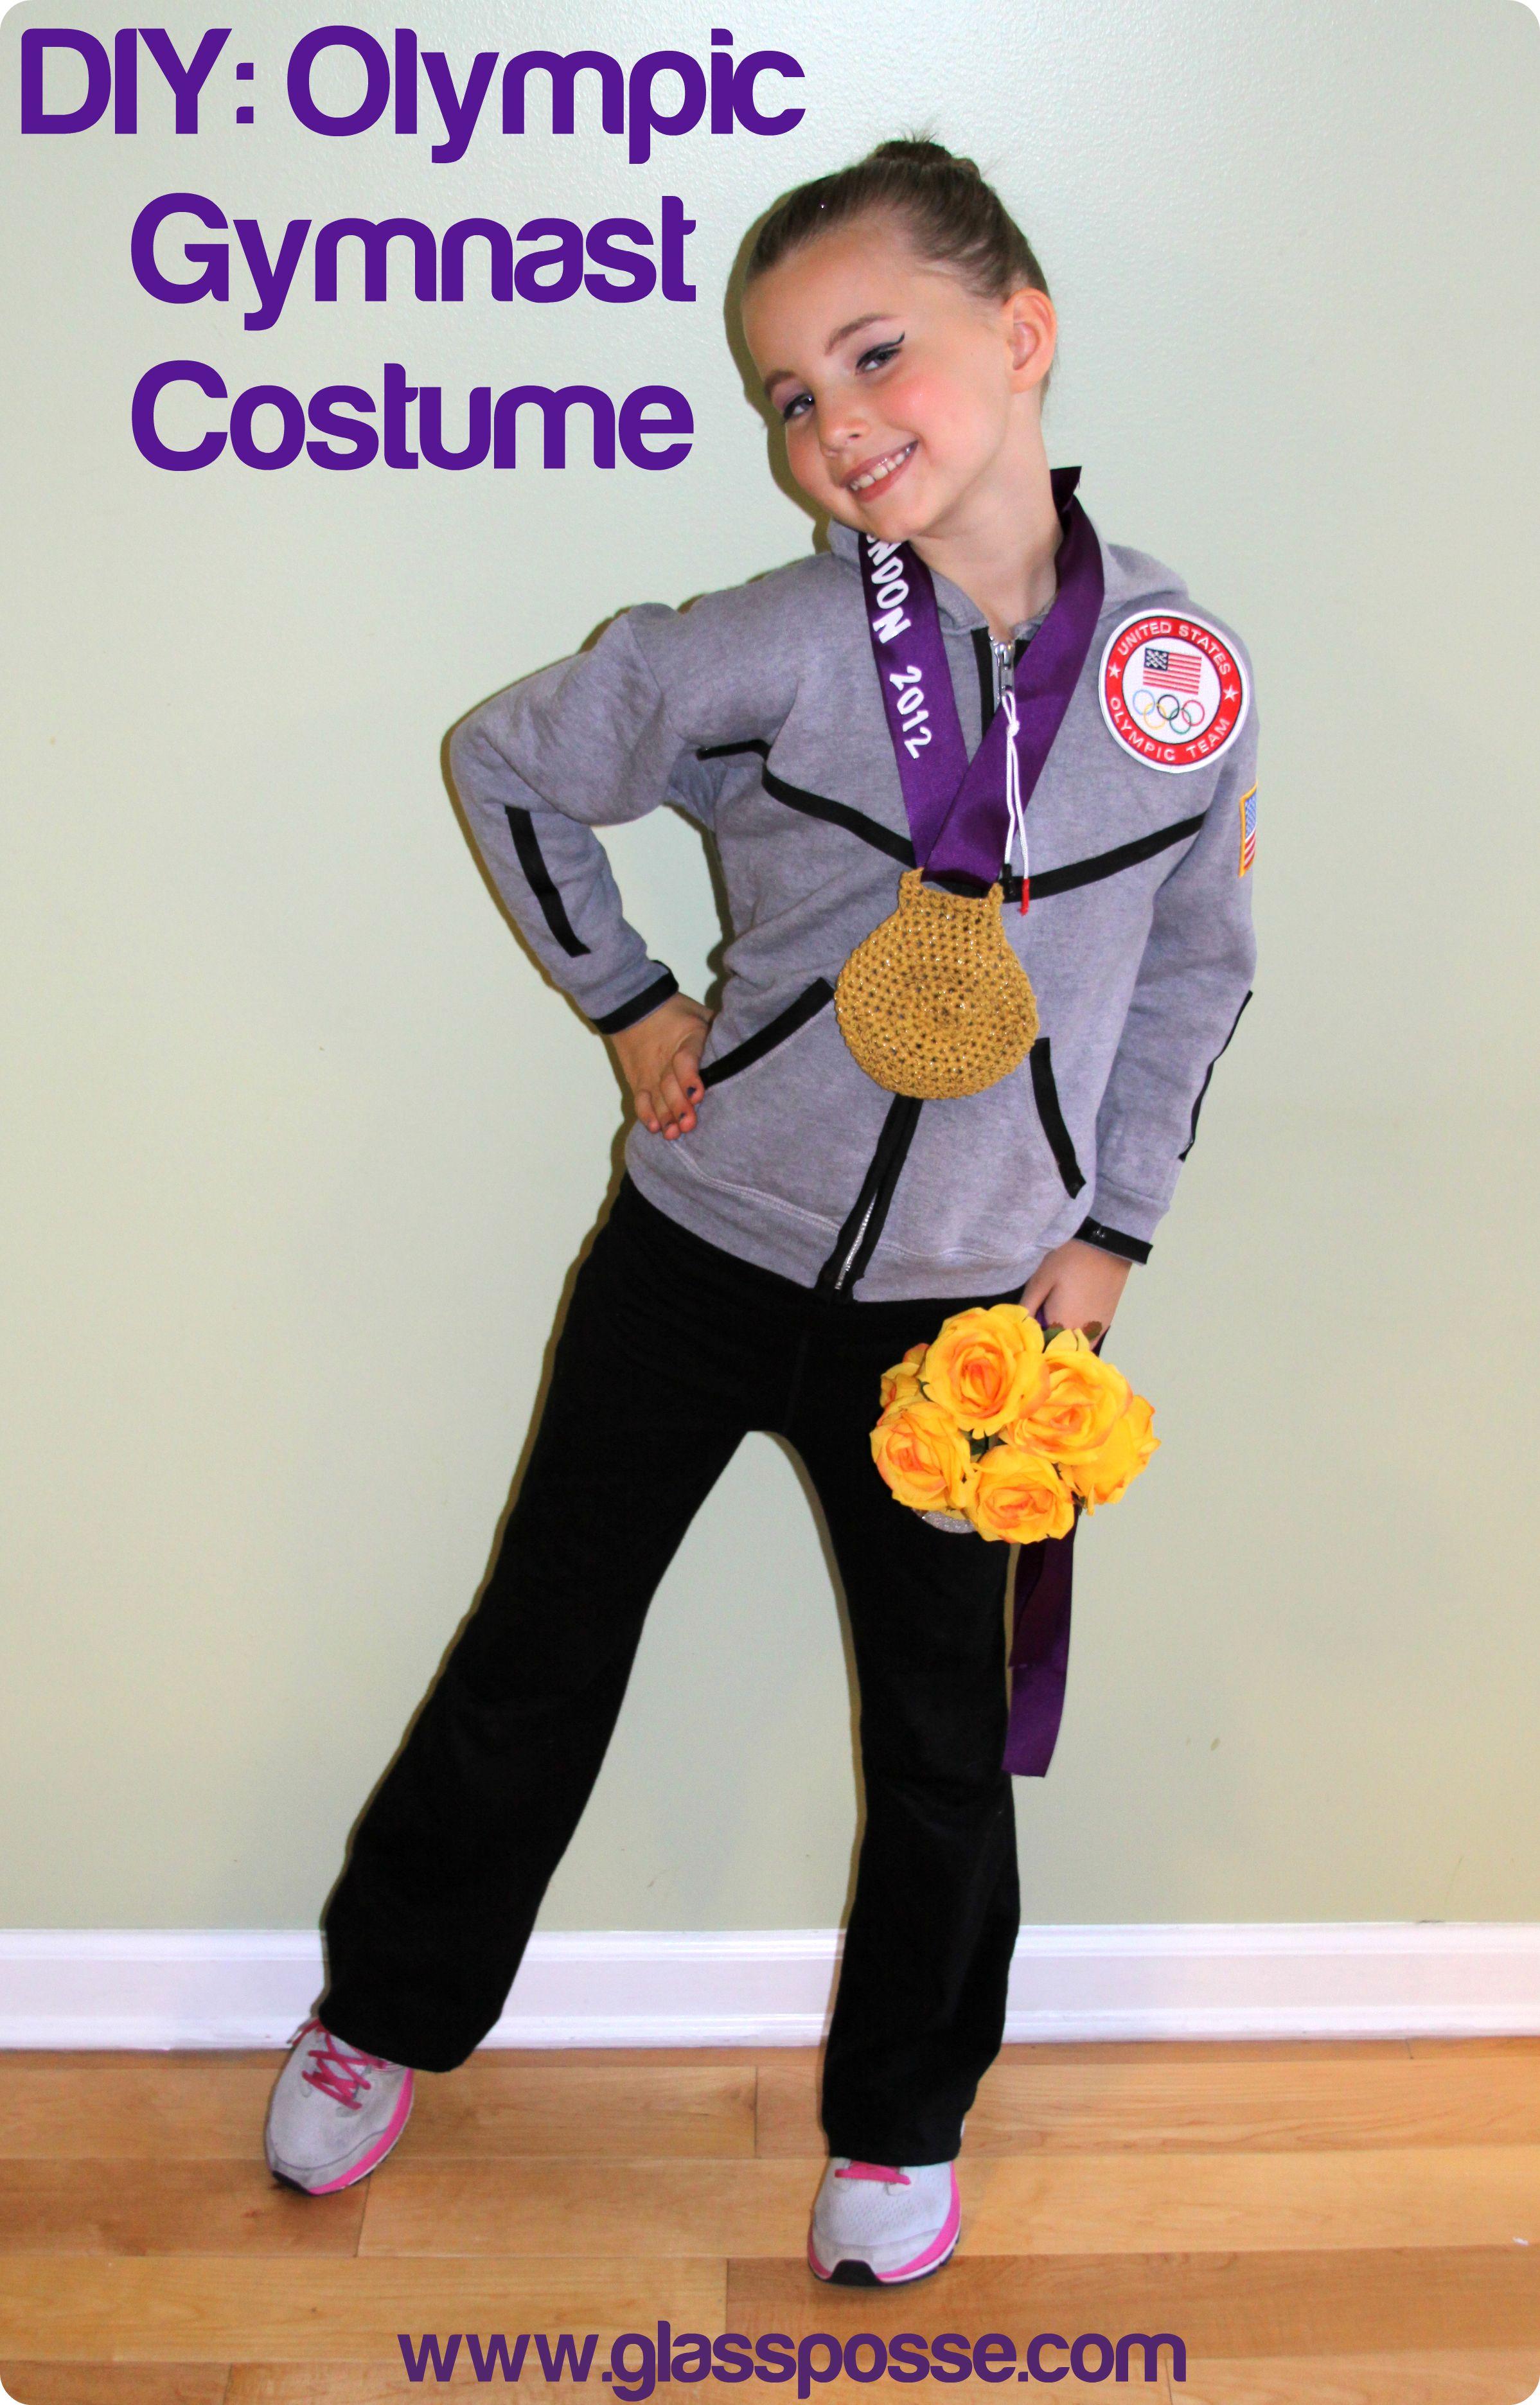 DIY: Olympic Gymnast Costume | Gymnasts, Olympics and Halloween ...